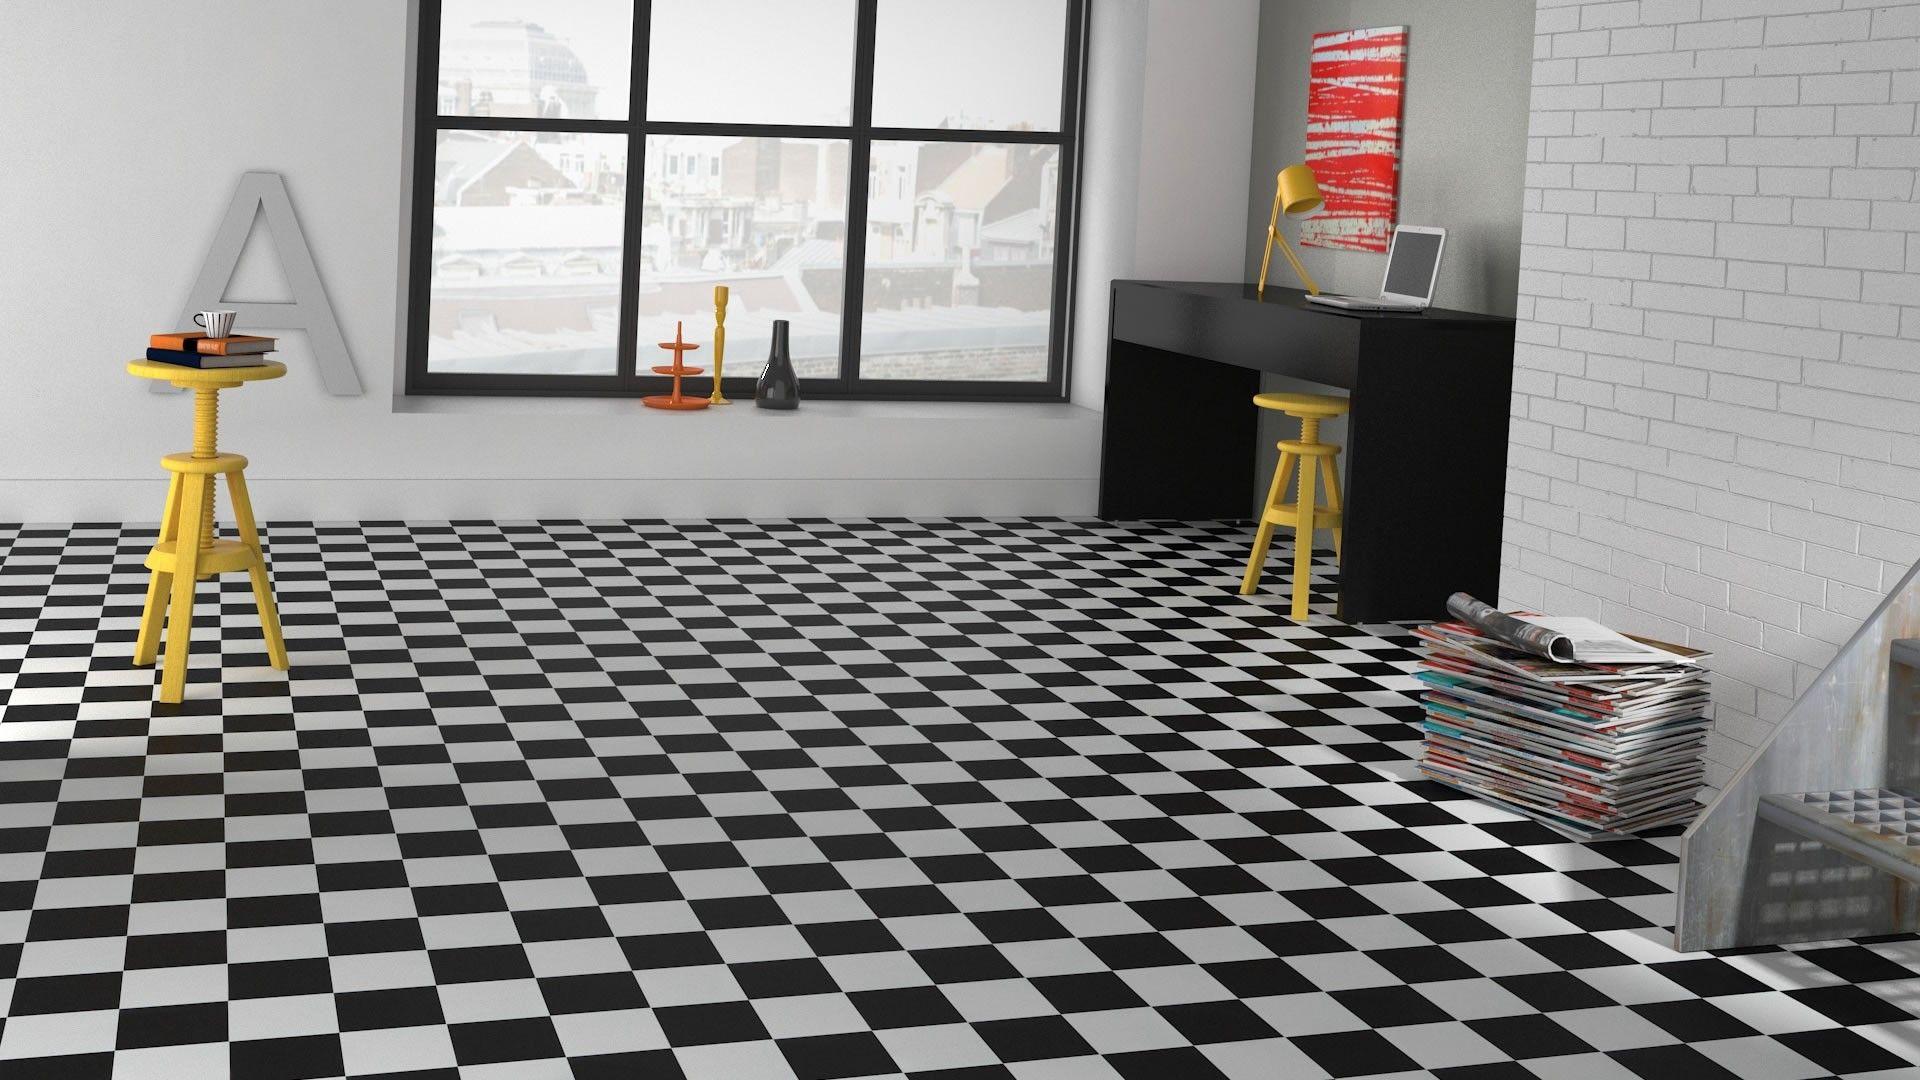 sol vinyle imitation carrelage damier noir et blanc. Black Bedroom Furniture Sets. Home Design Ideas